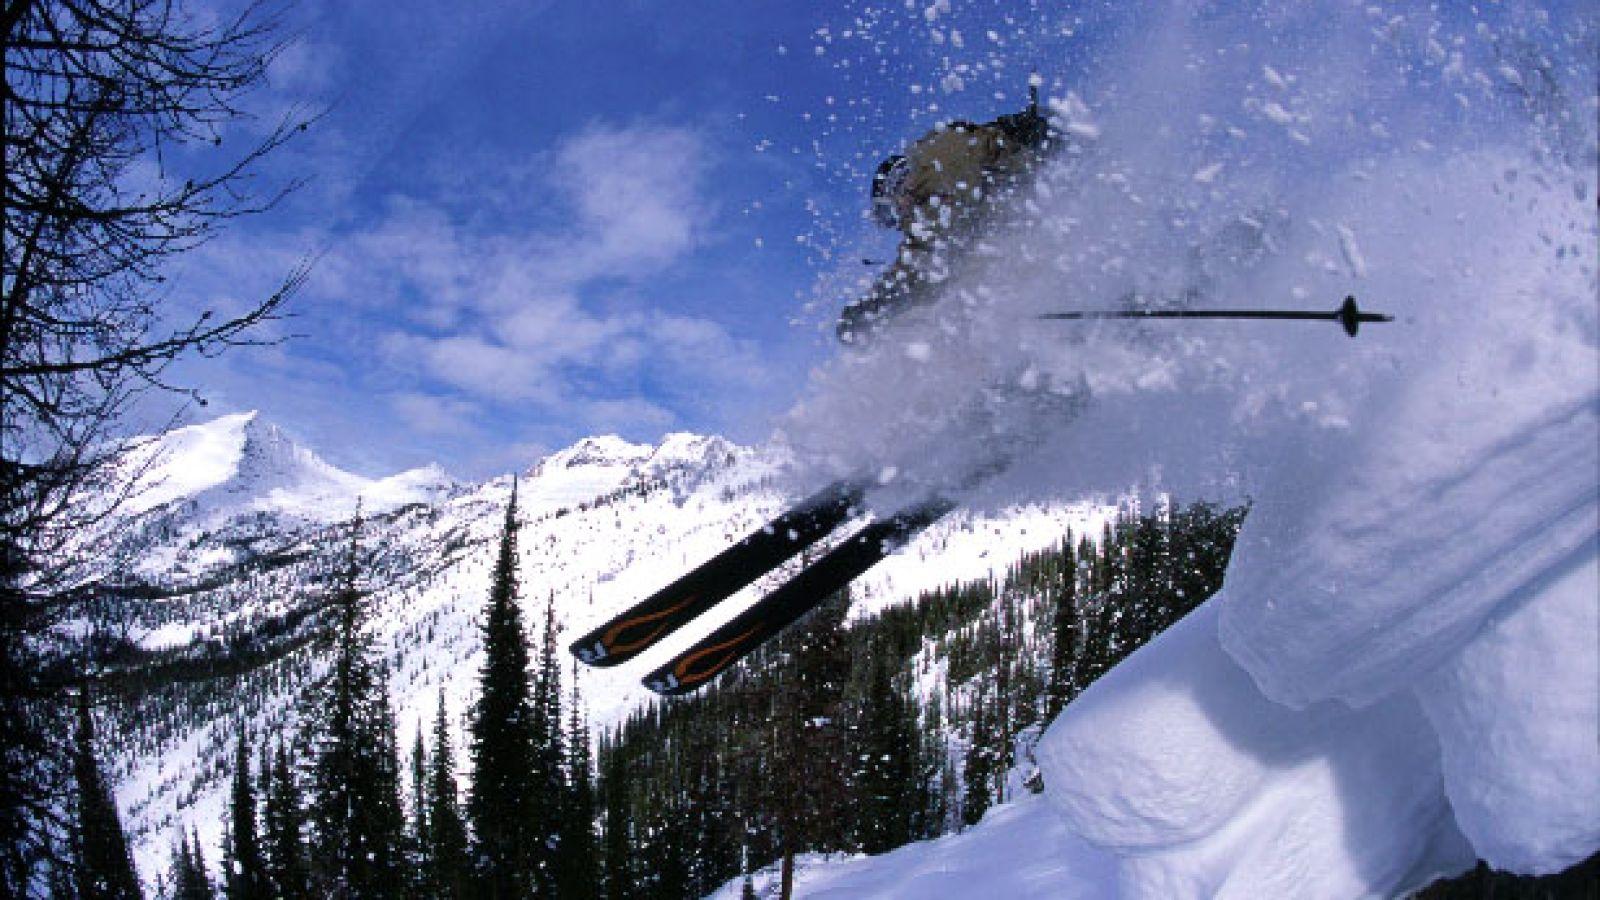 Skiing untouched terrain.